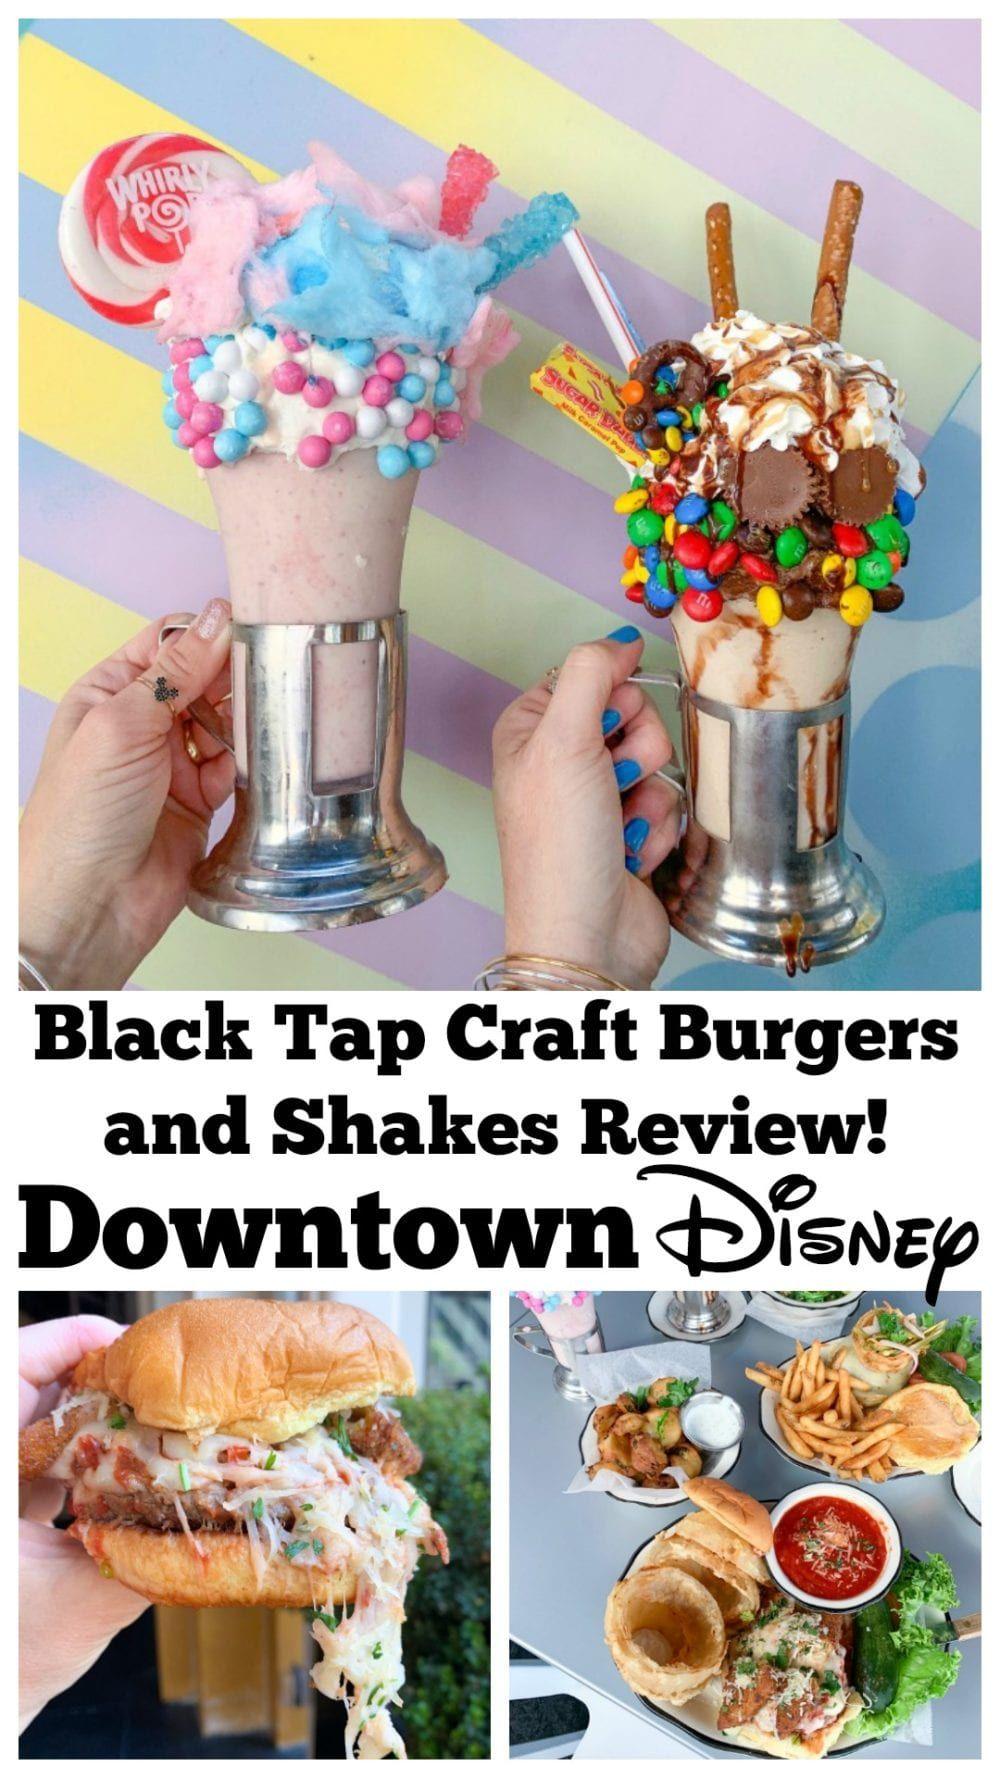 Photo of Black Tap Craft Burger und Shakes Bewertung Downtown Disney!